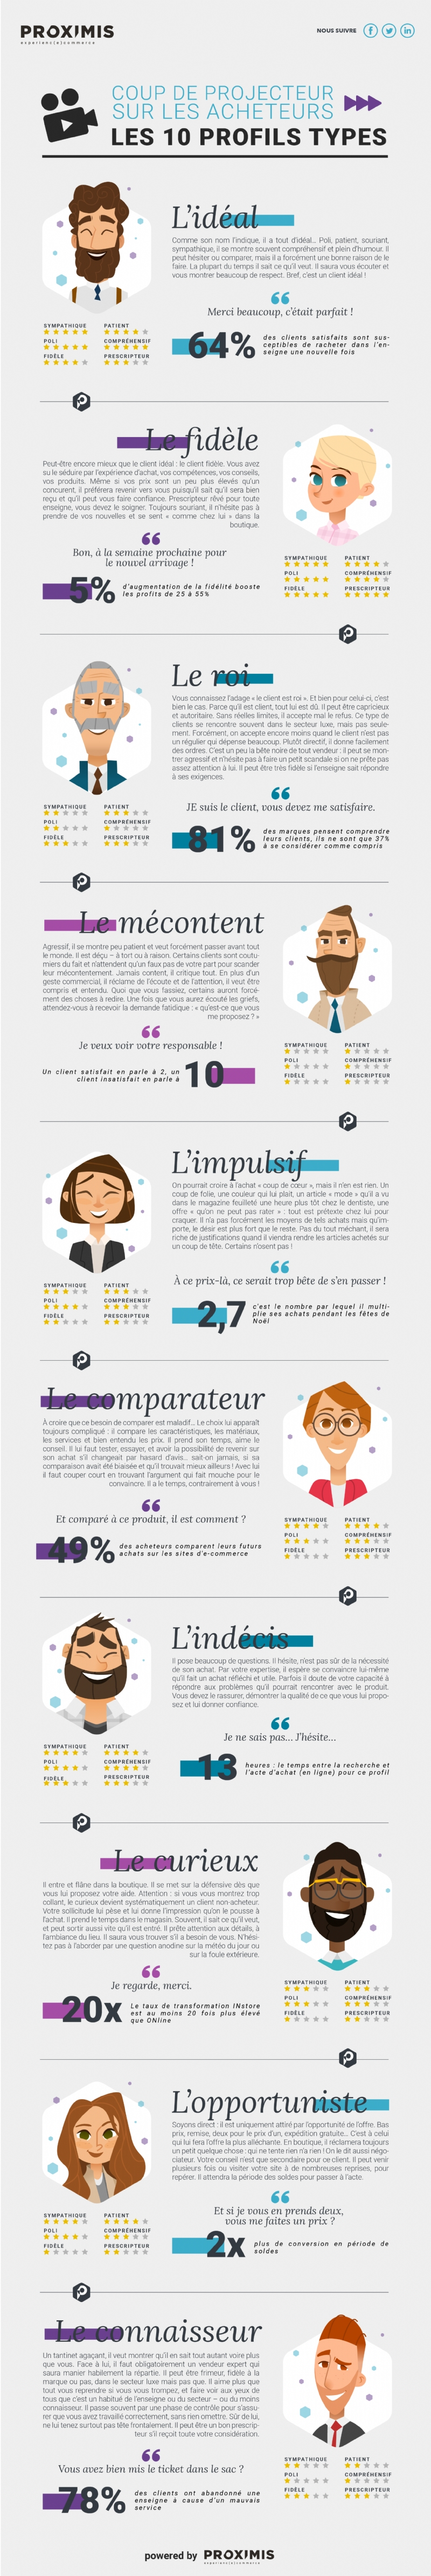 Profils types acheteurs